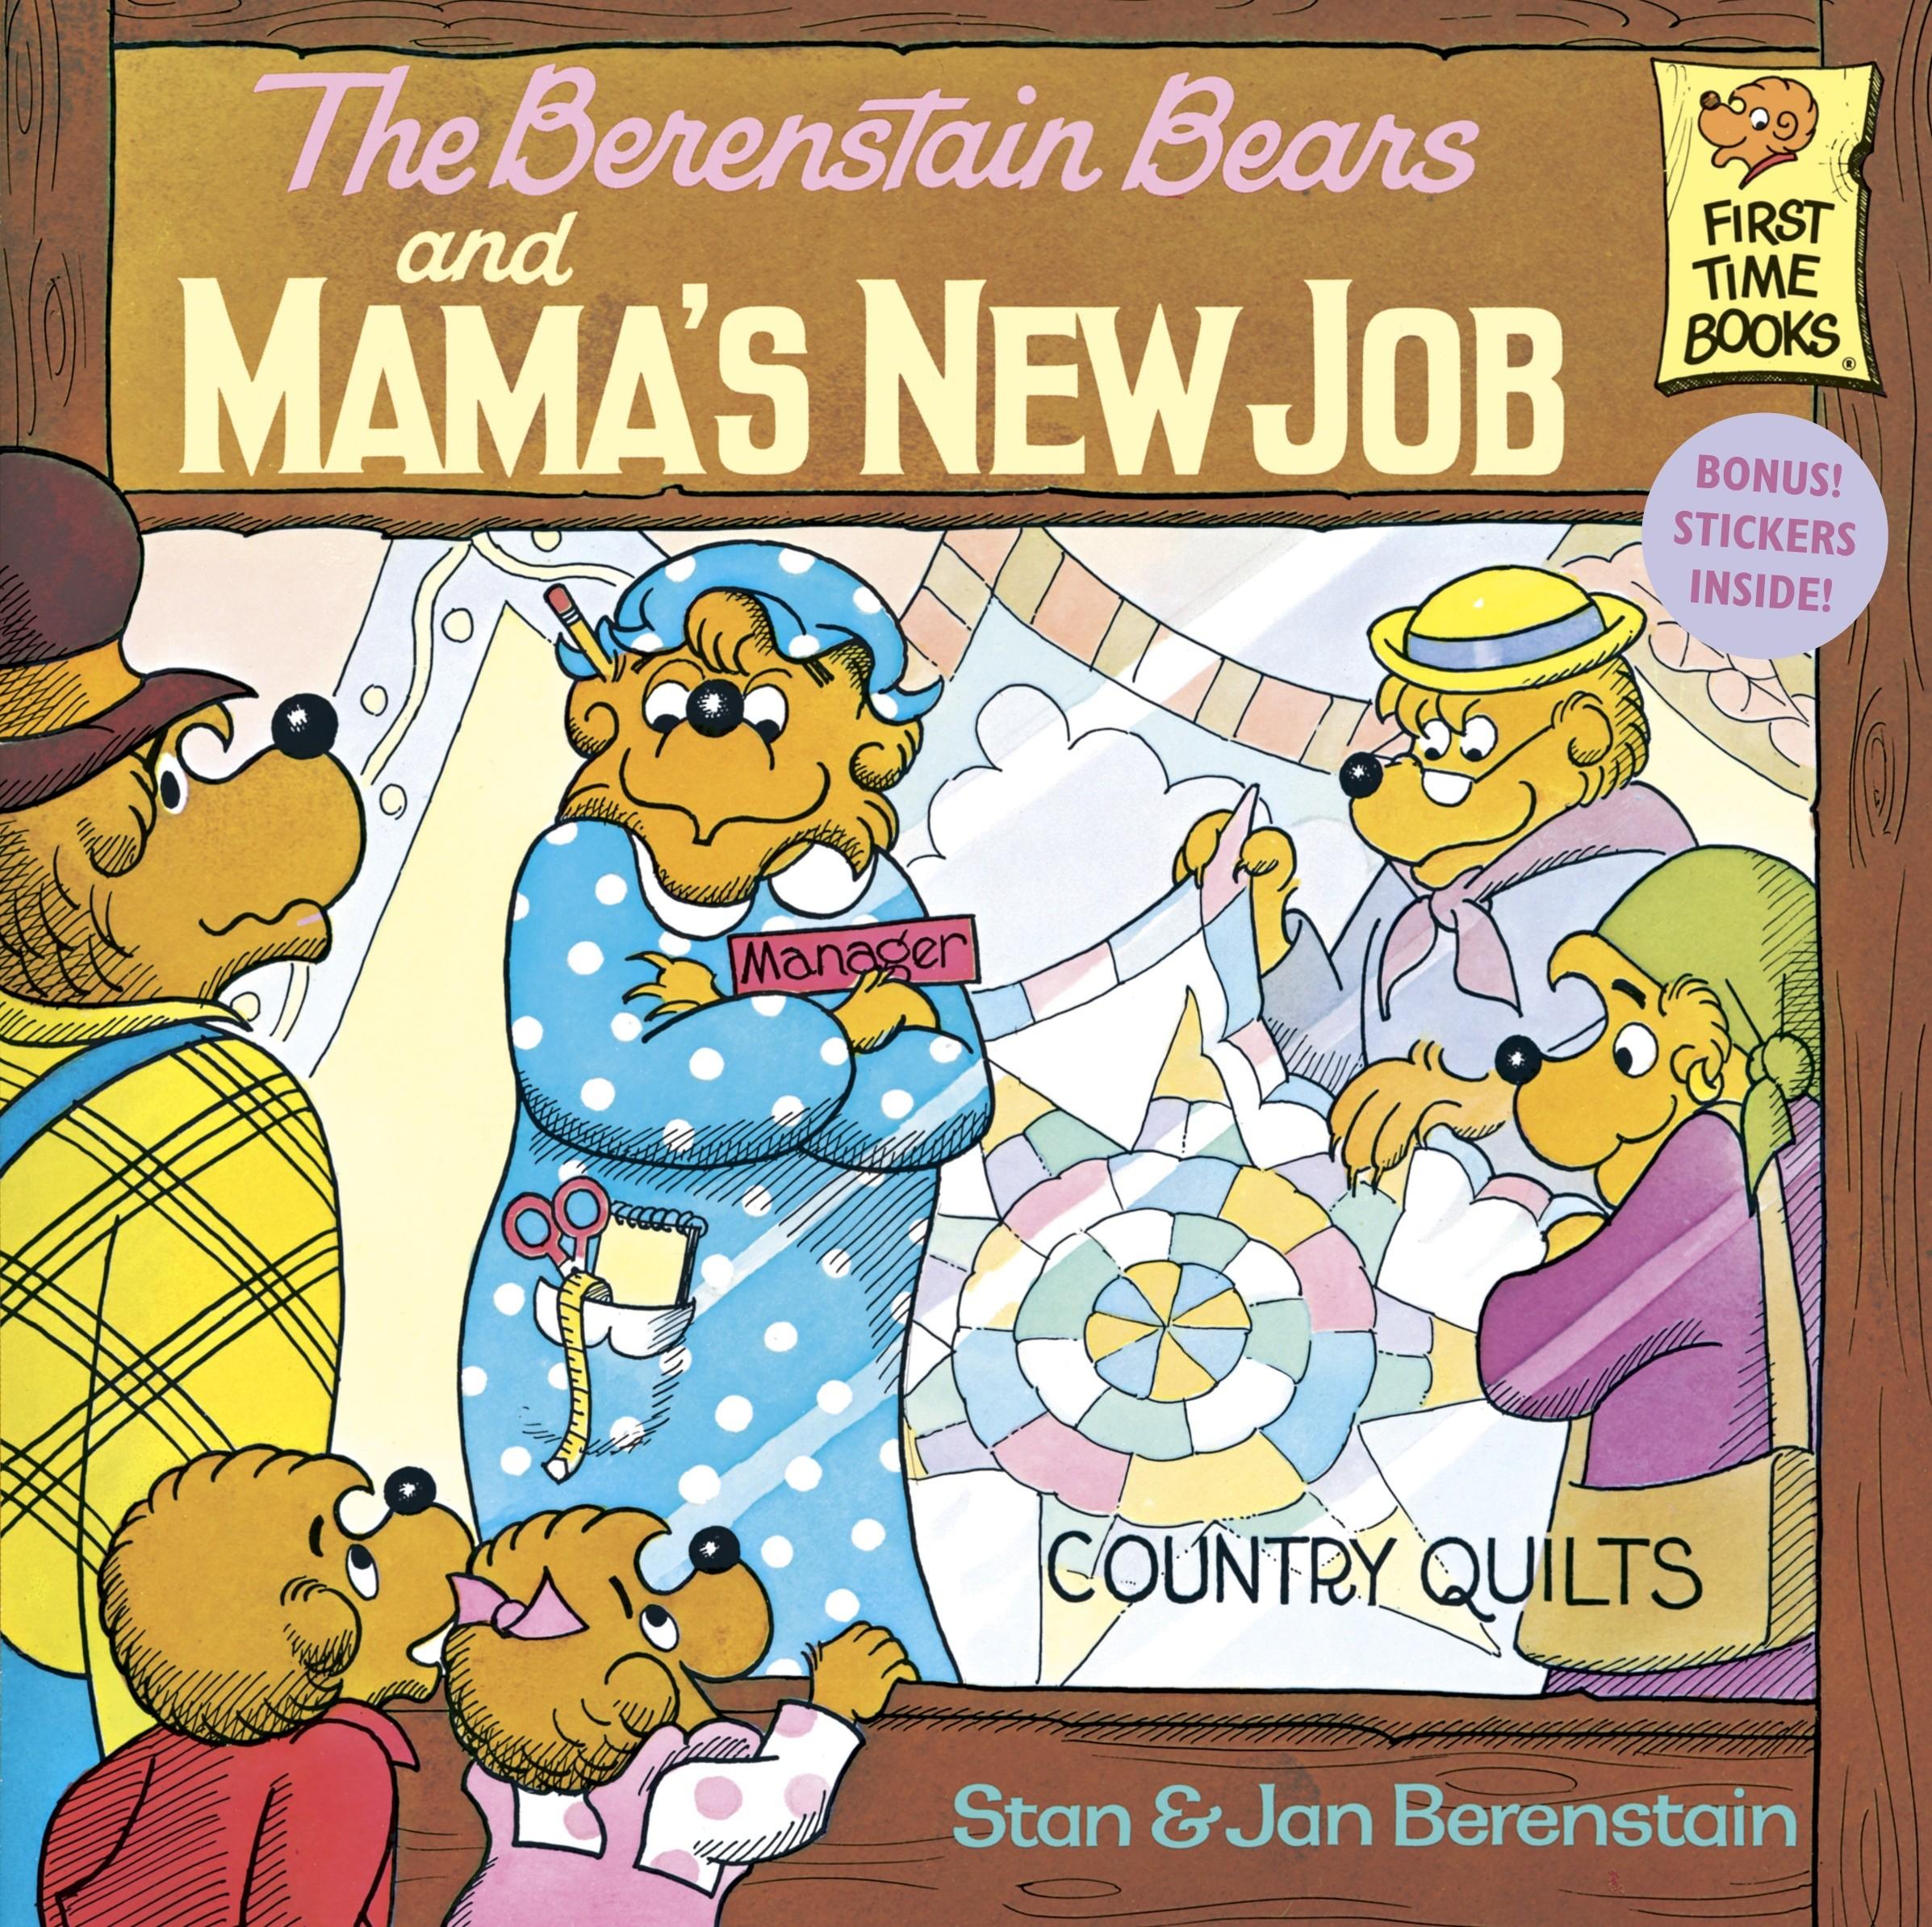 The Berenstain Bears and Mama's New Job